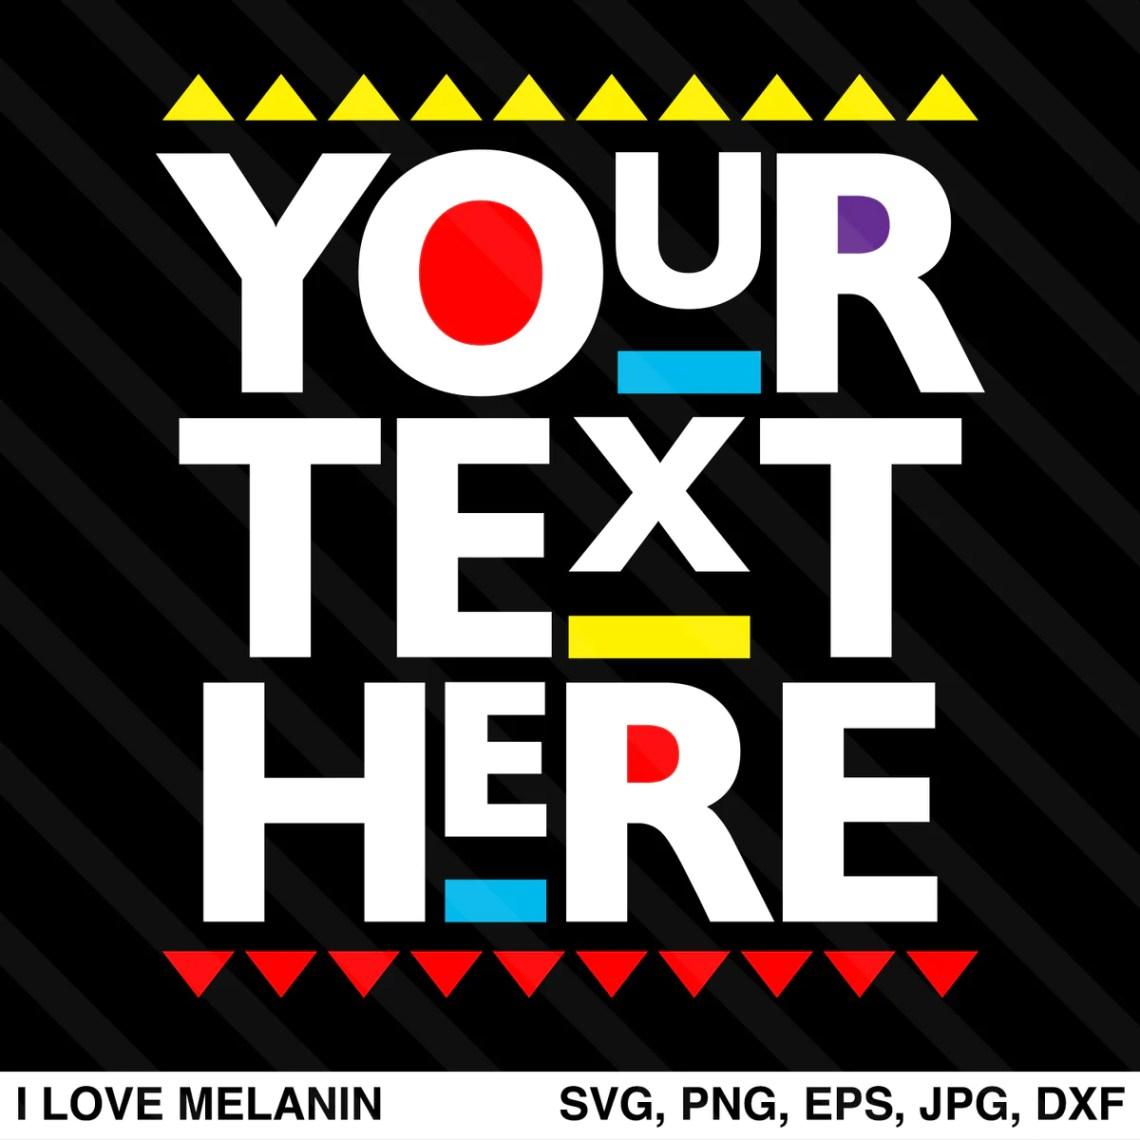 Download Martin Font Custom Design SVG - I Love Melanin